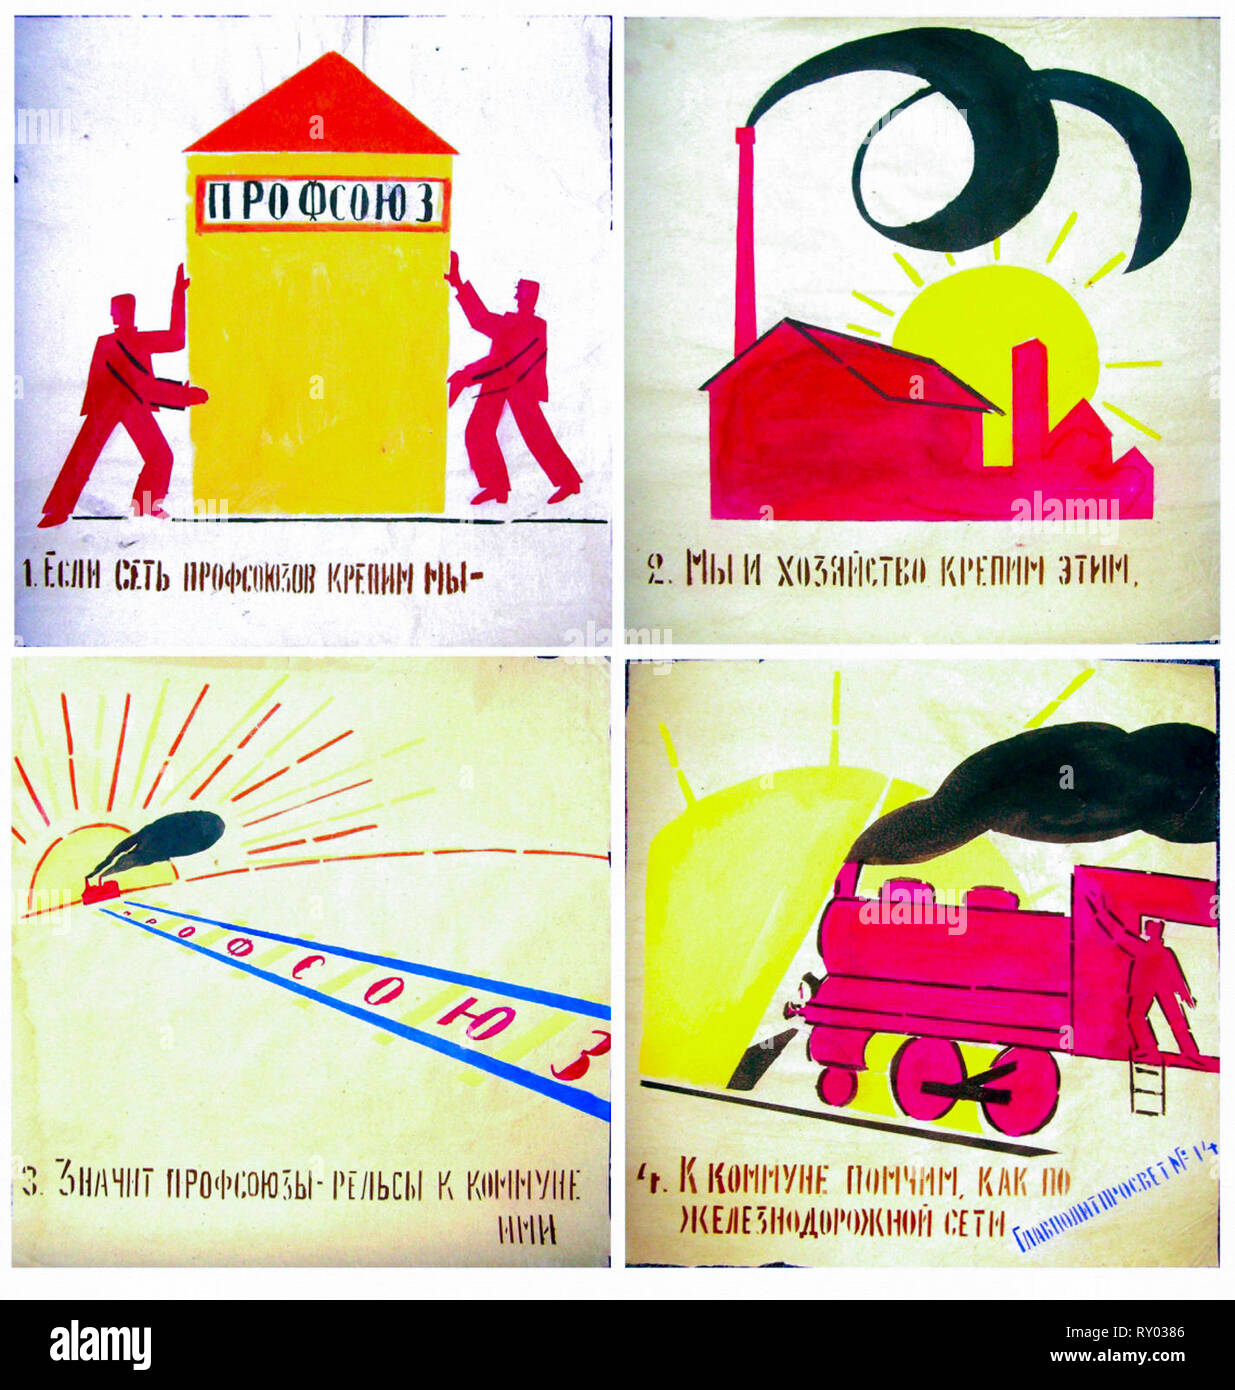 ROSTA windows, stencilled Soviet propaganda poster, Trade Union Movement Week. Strengthen trade unions, 1921 - Stock Image